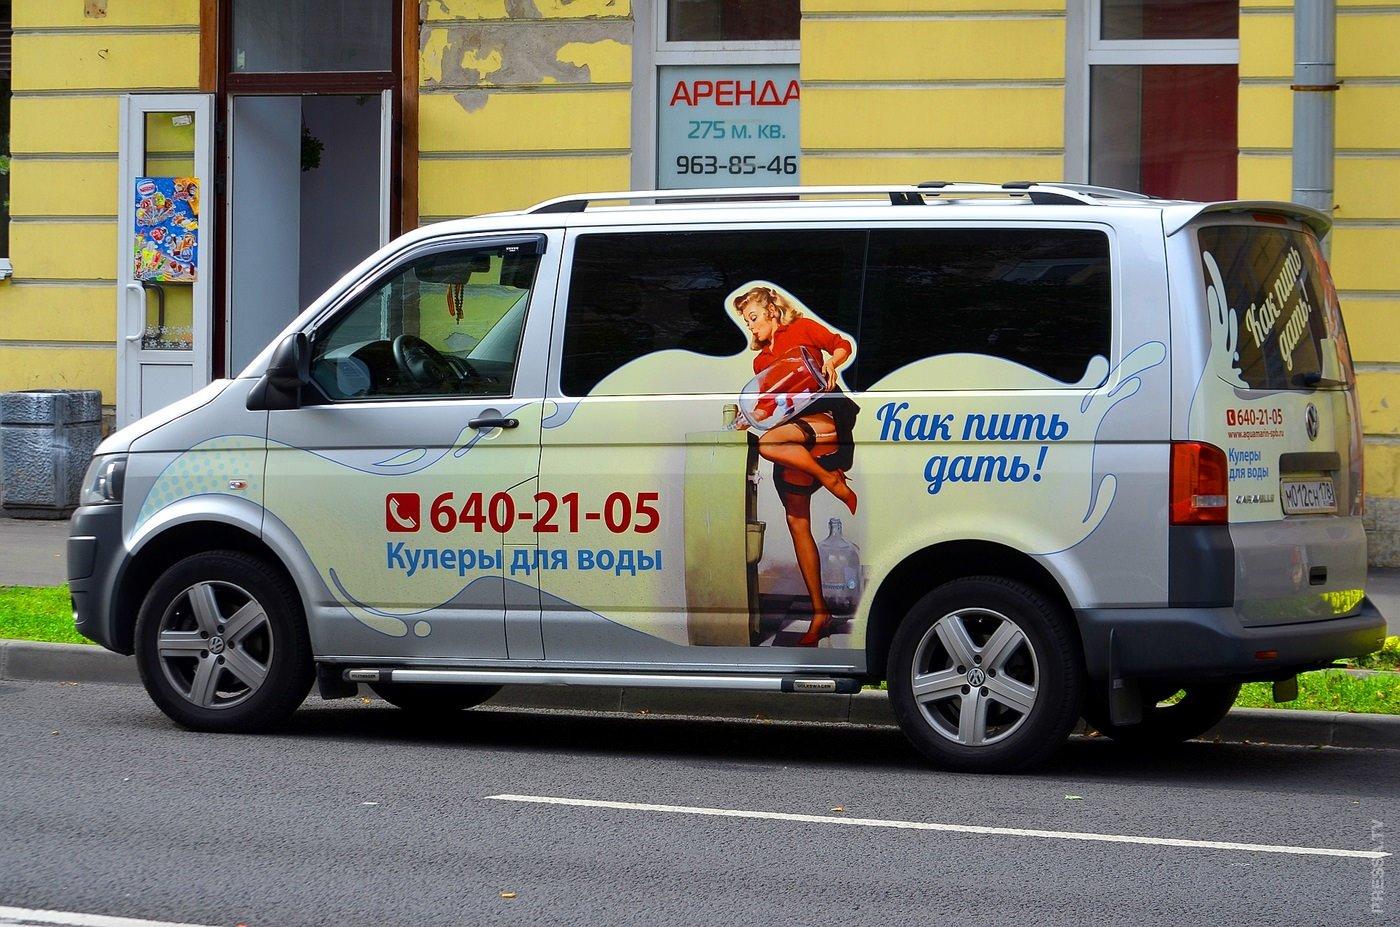 Приколы в рекламе картинки